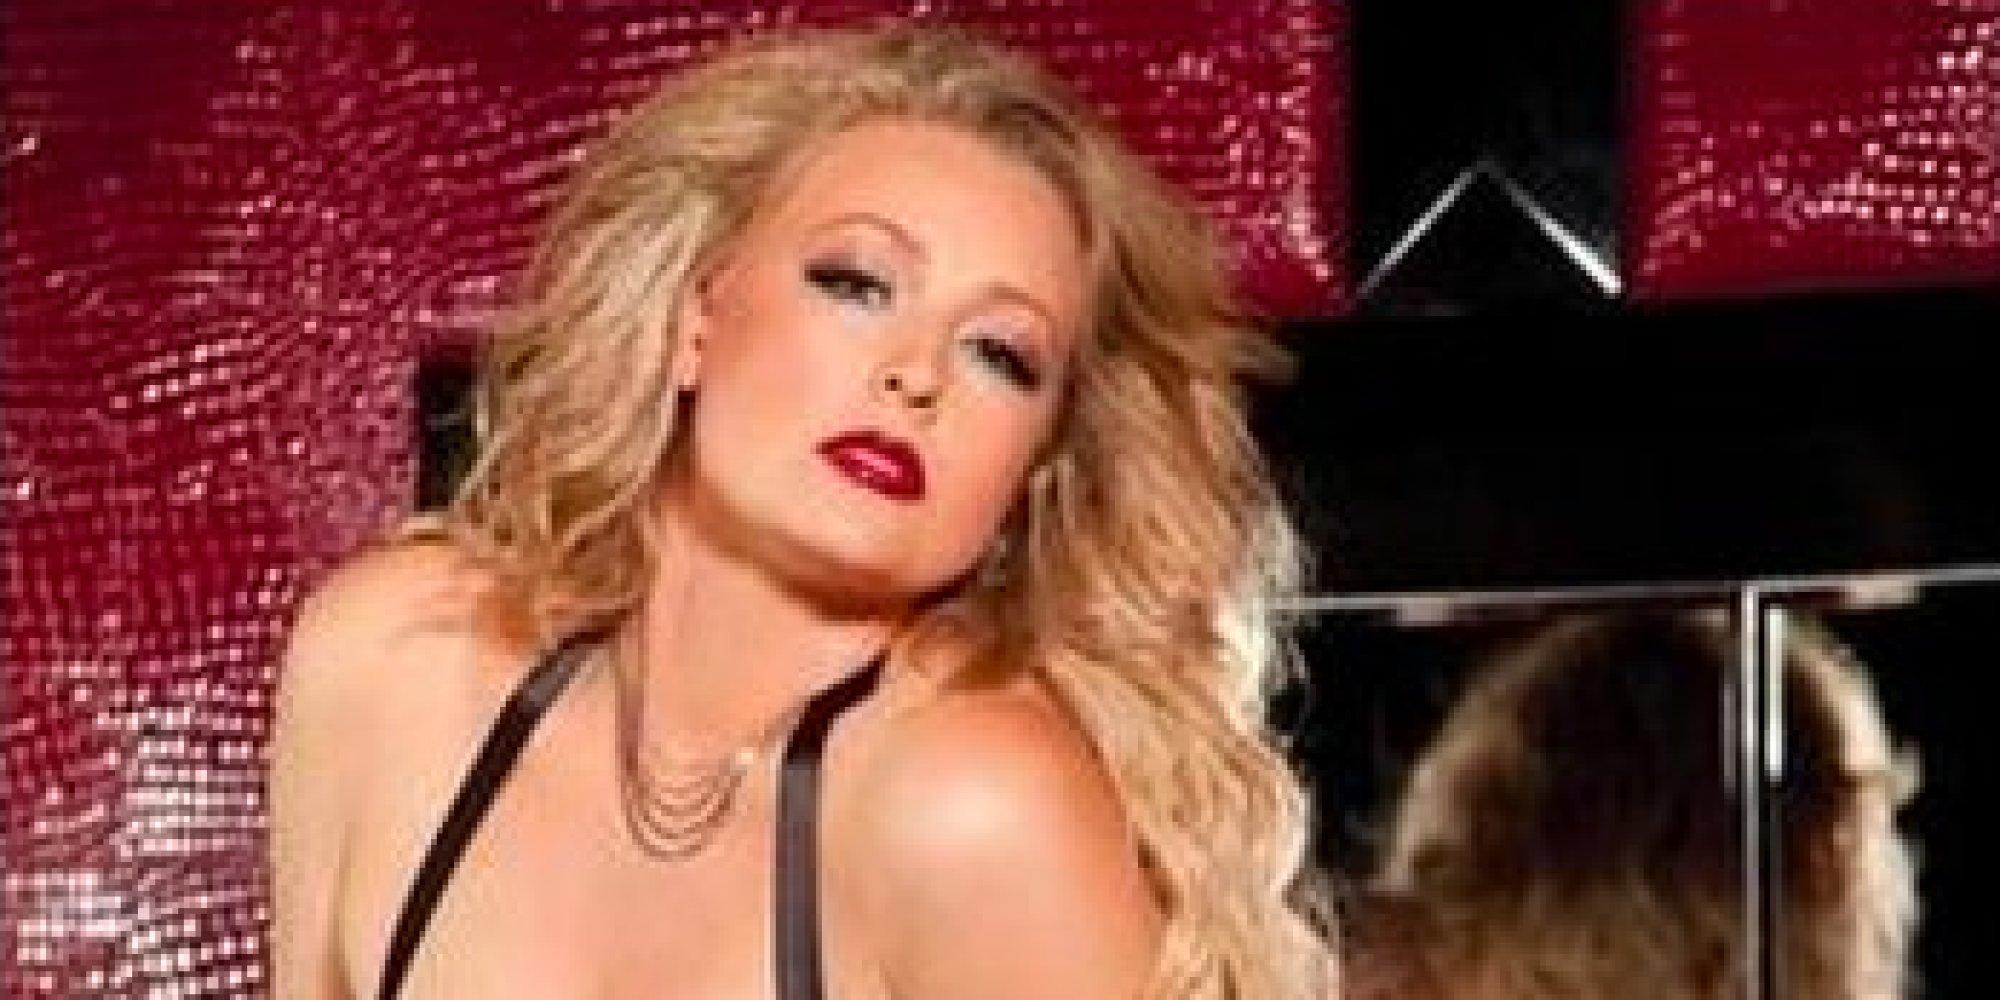 curvy girl lingerie's super bowl commercial could bring plus-sizes